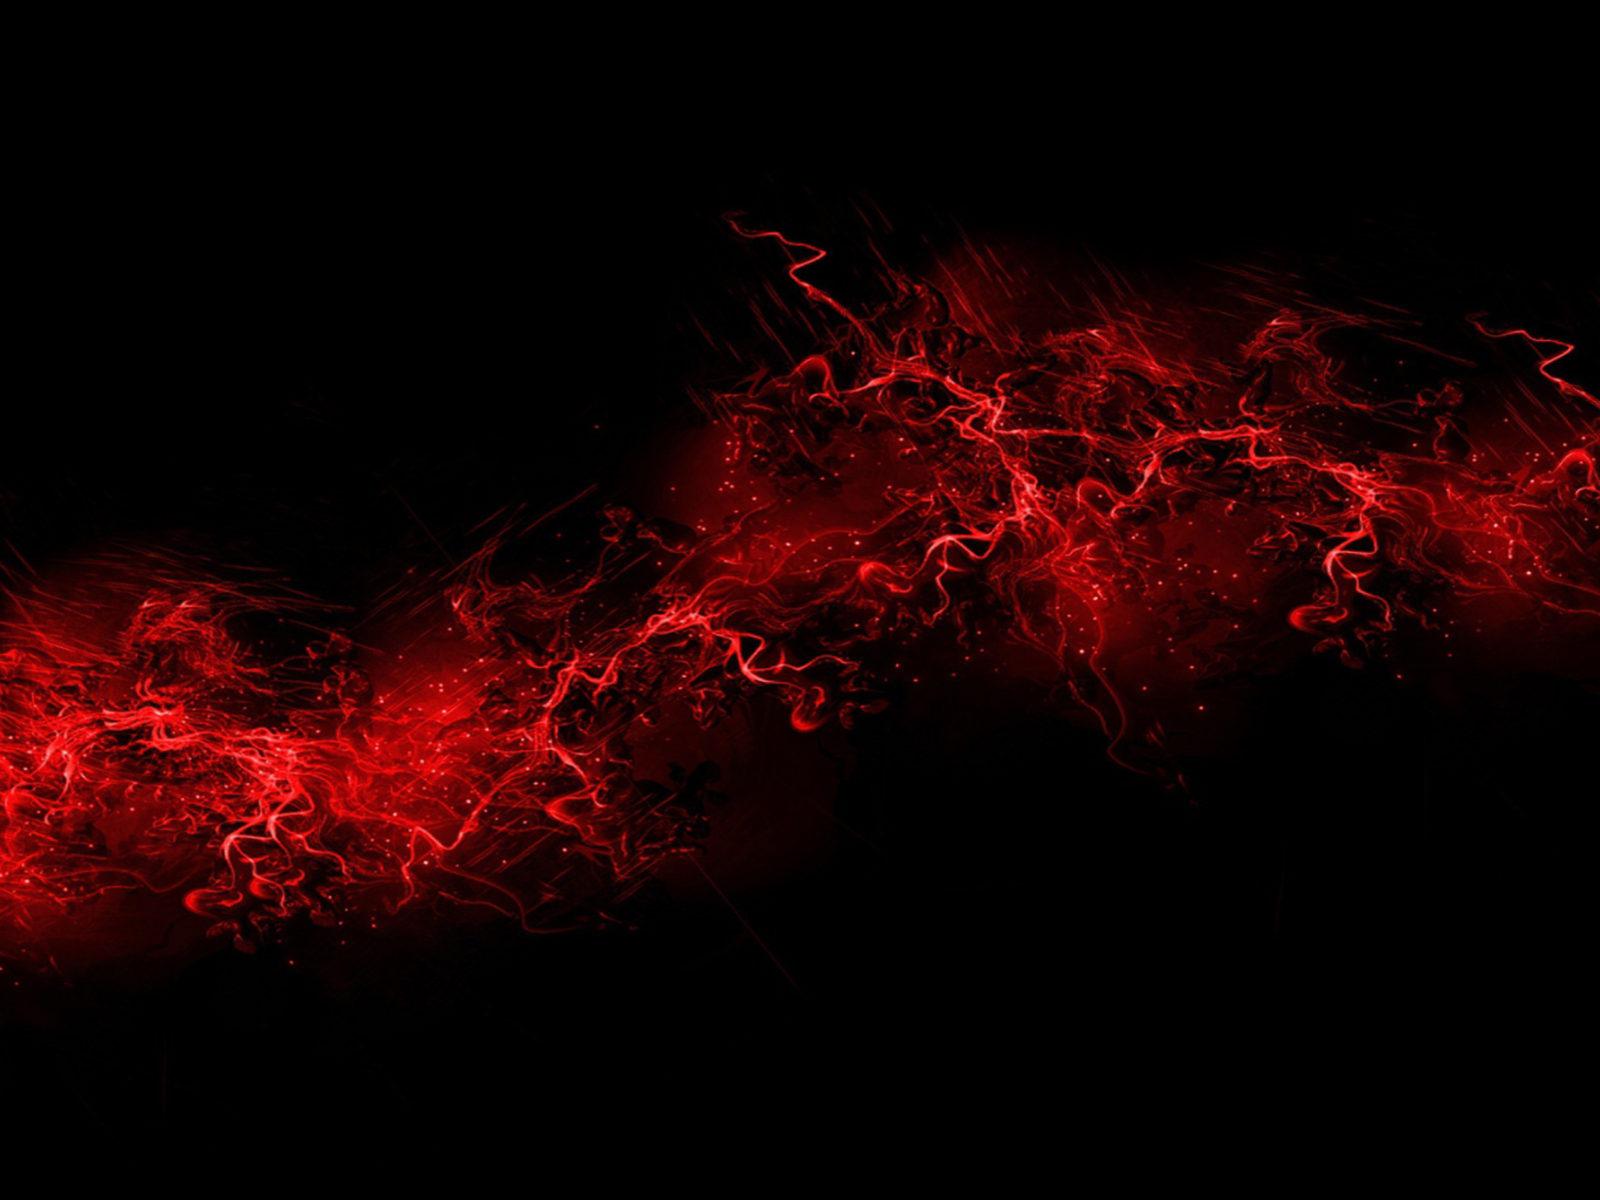 Cowboy Bebop Iphone X Wallpaper Black Background Red Color Paint Explosion Burst 746